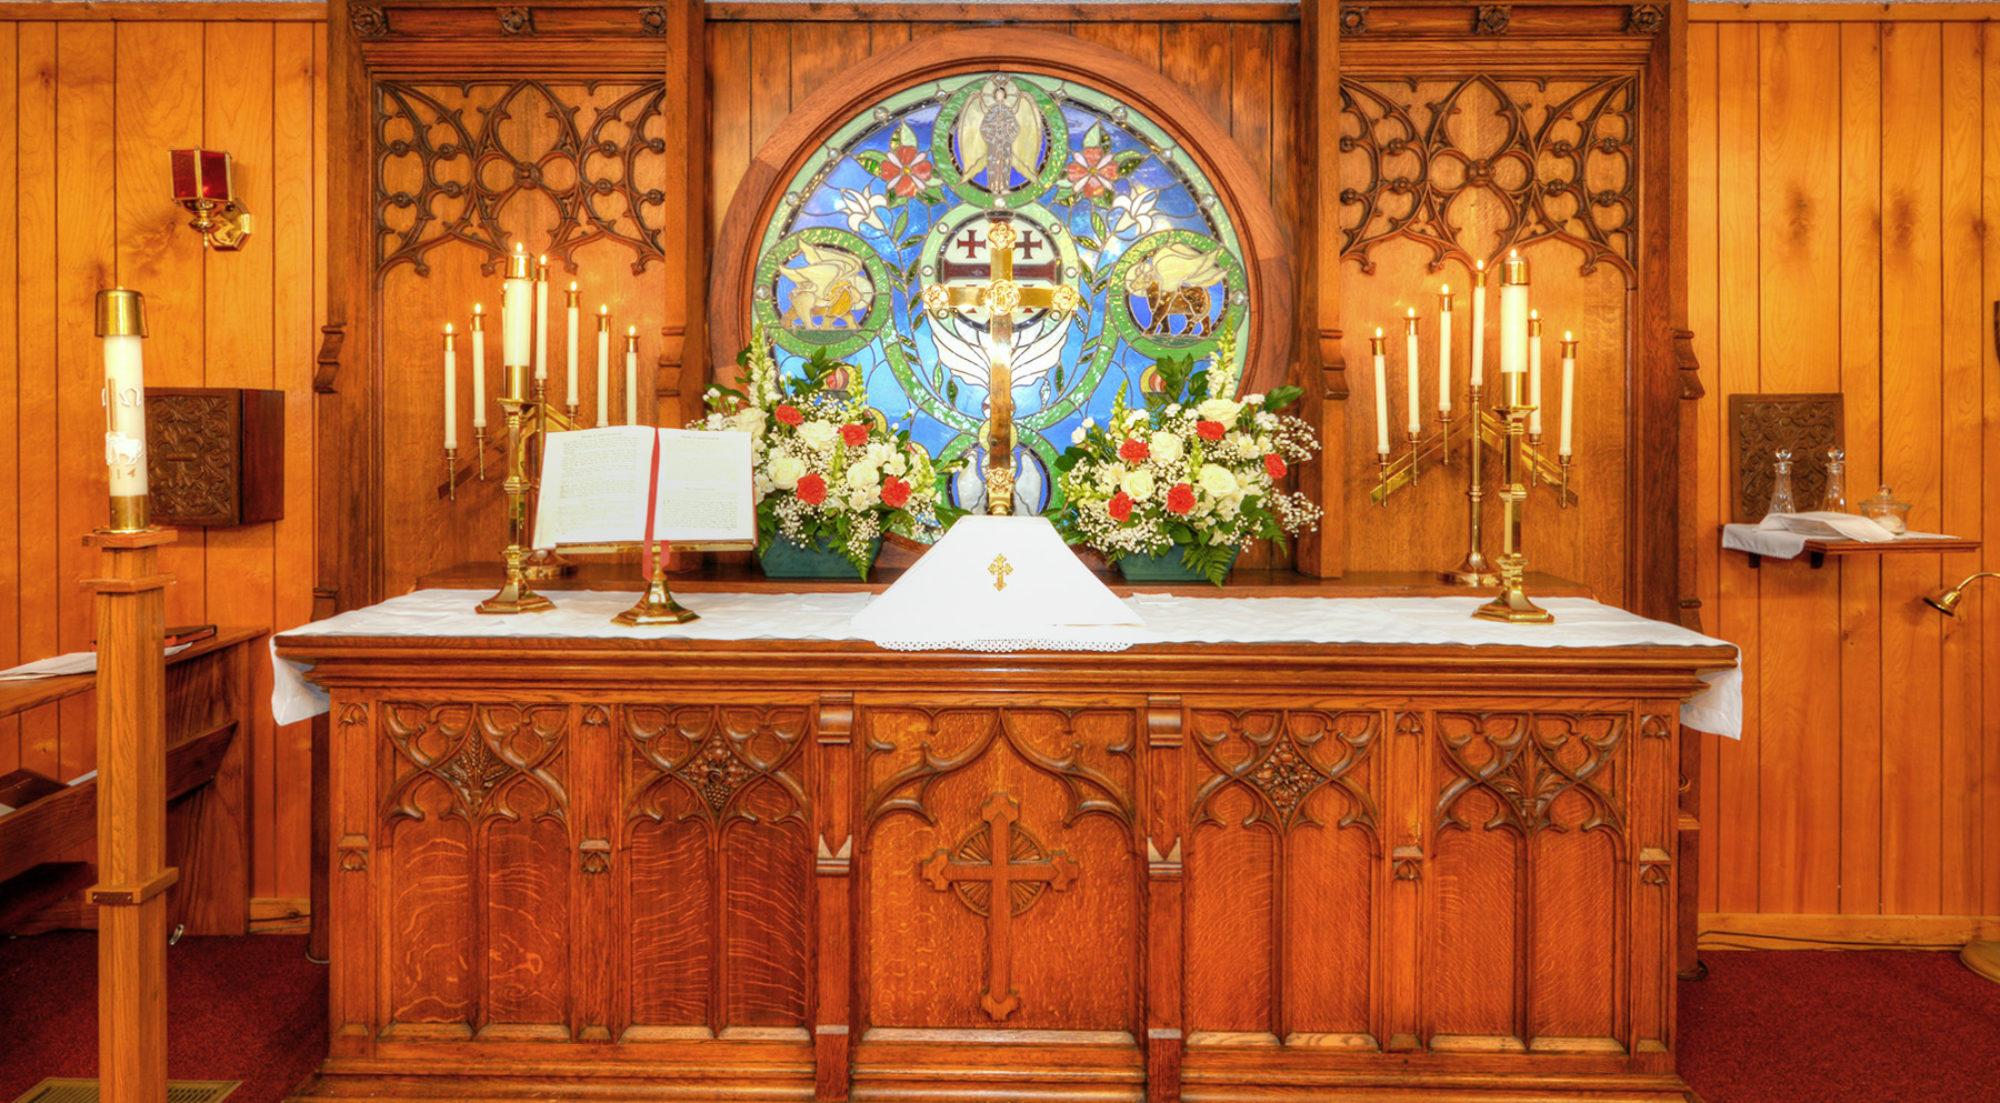 St. Chad's Anglican Church